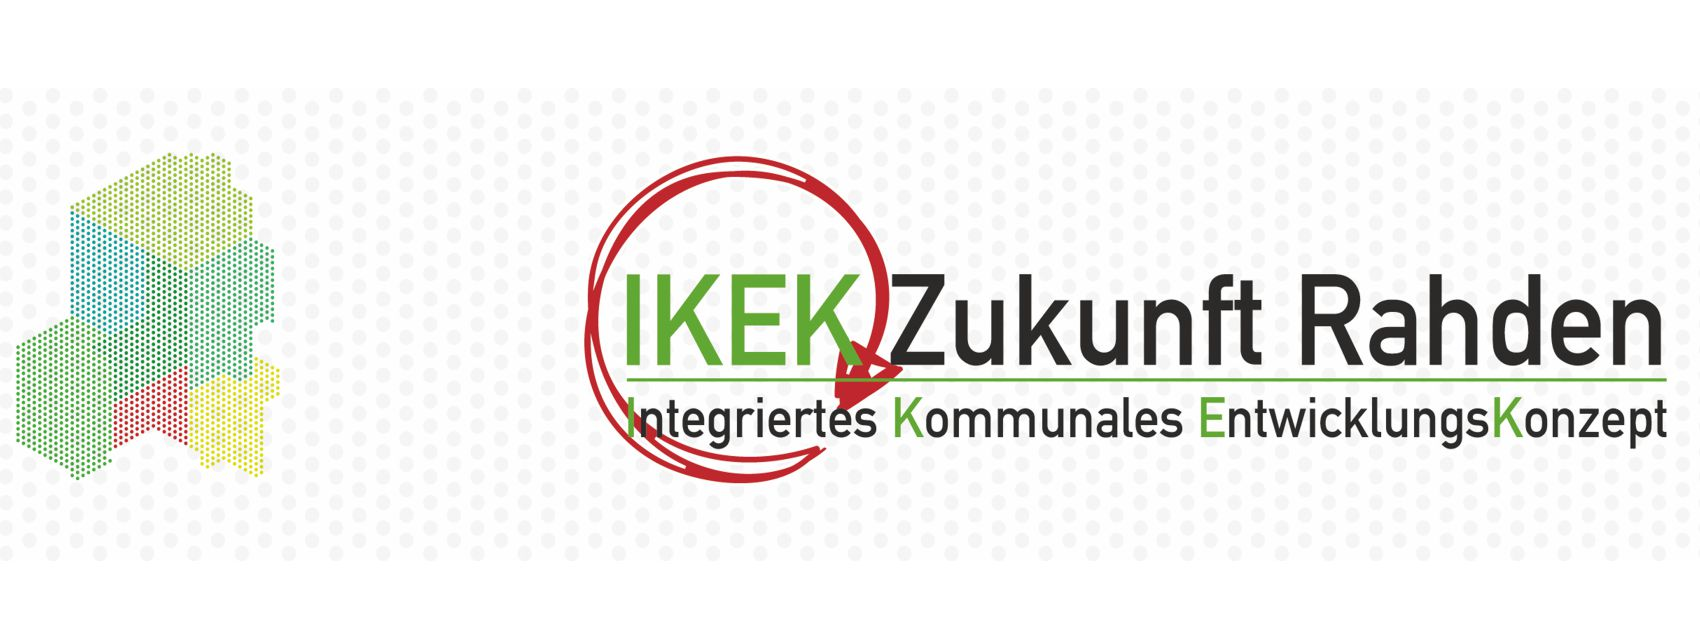 Banner_Ikek